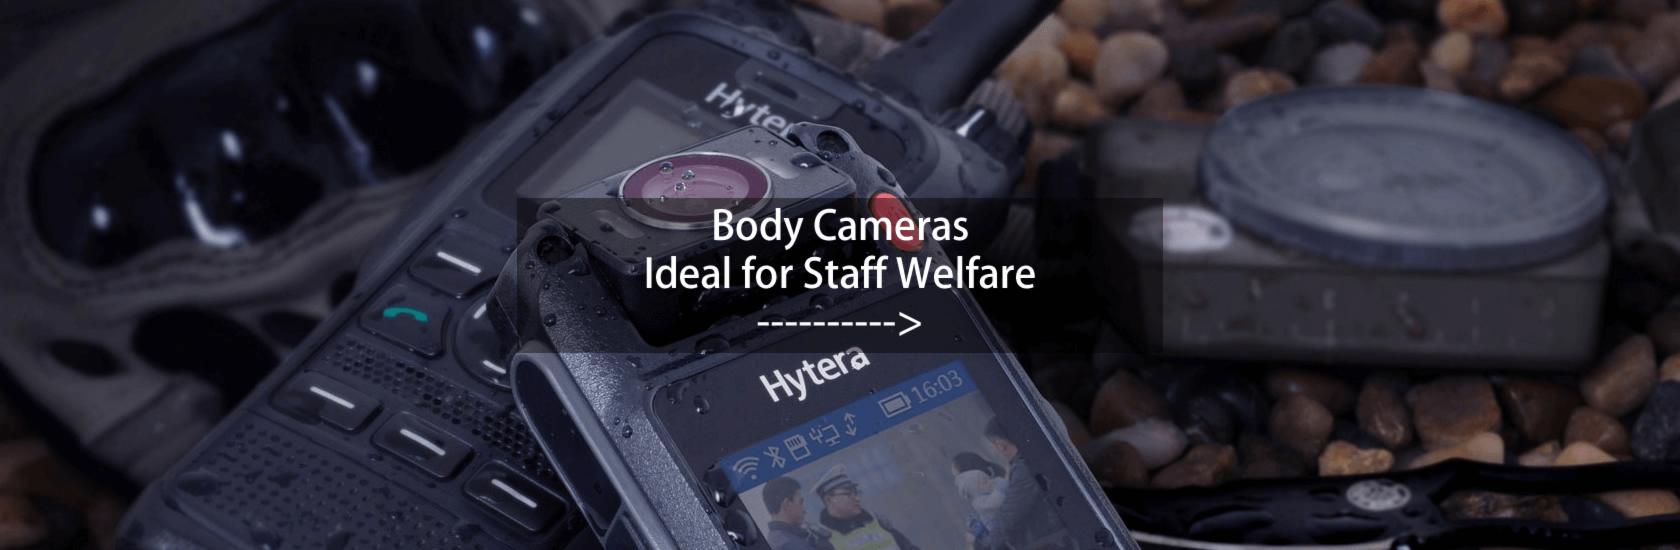 Hytera Body Cameras